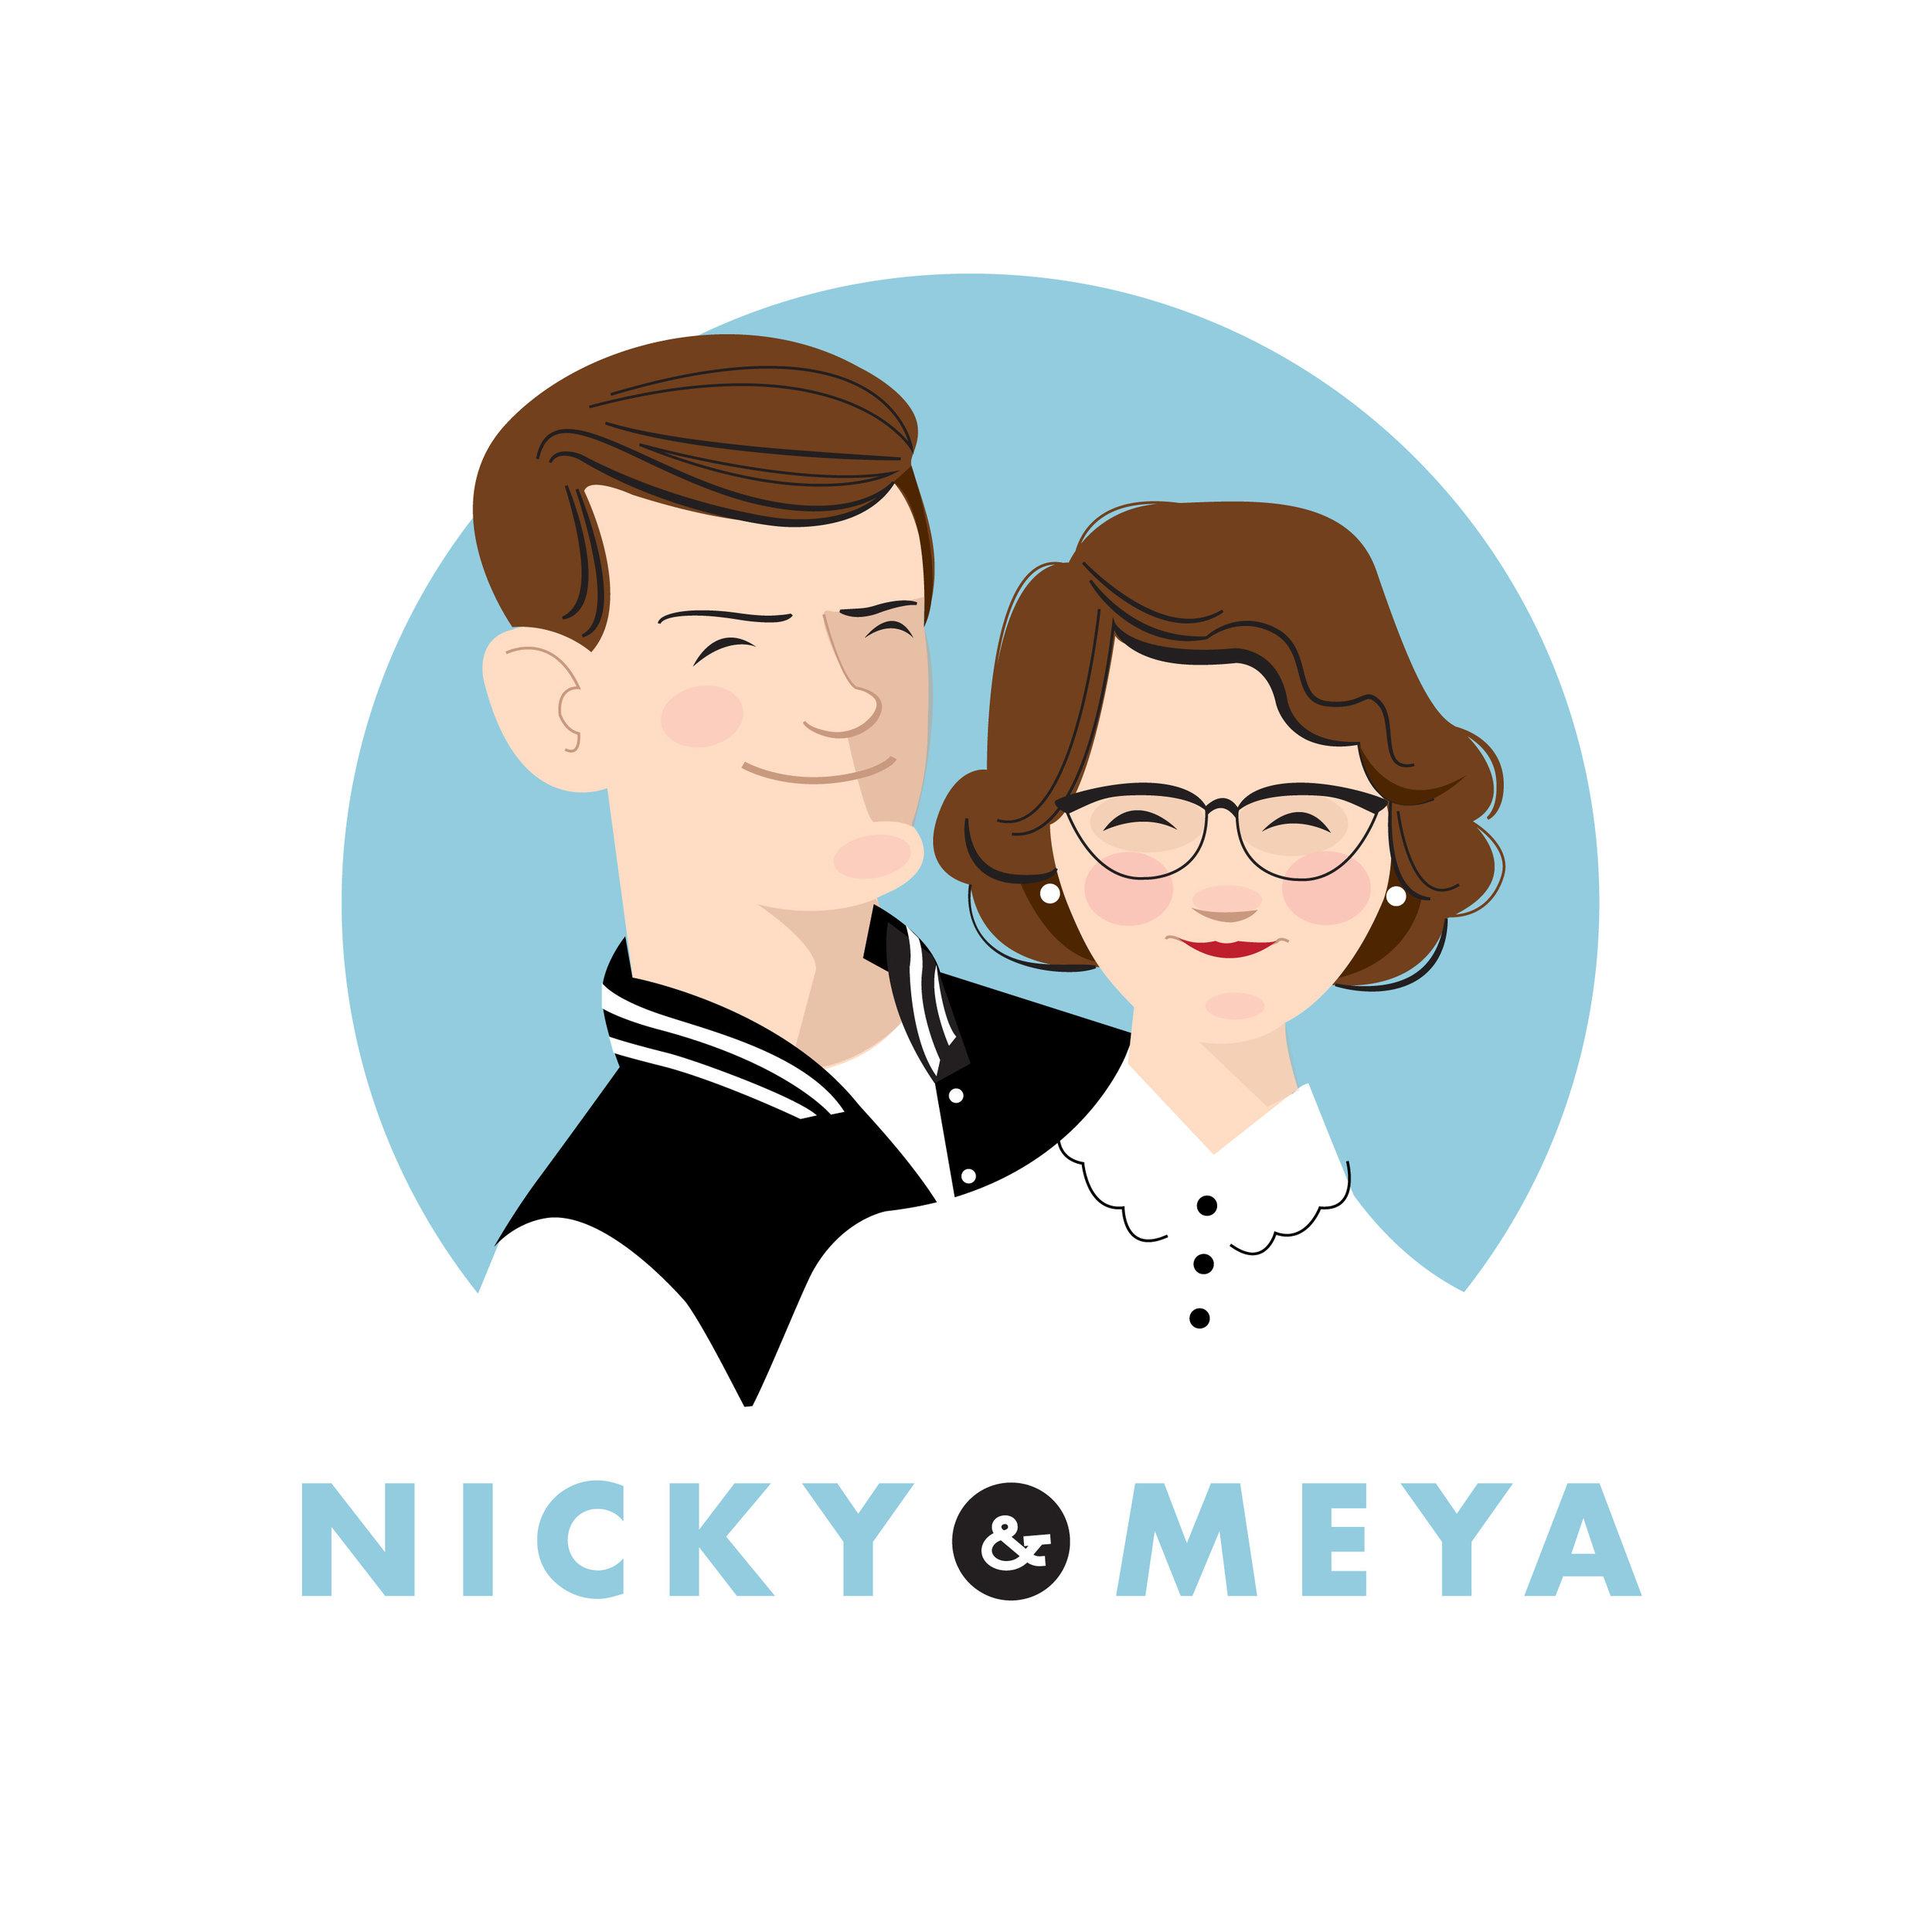 nicky&meya_blue4.jpg